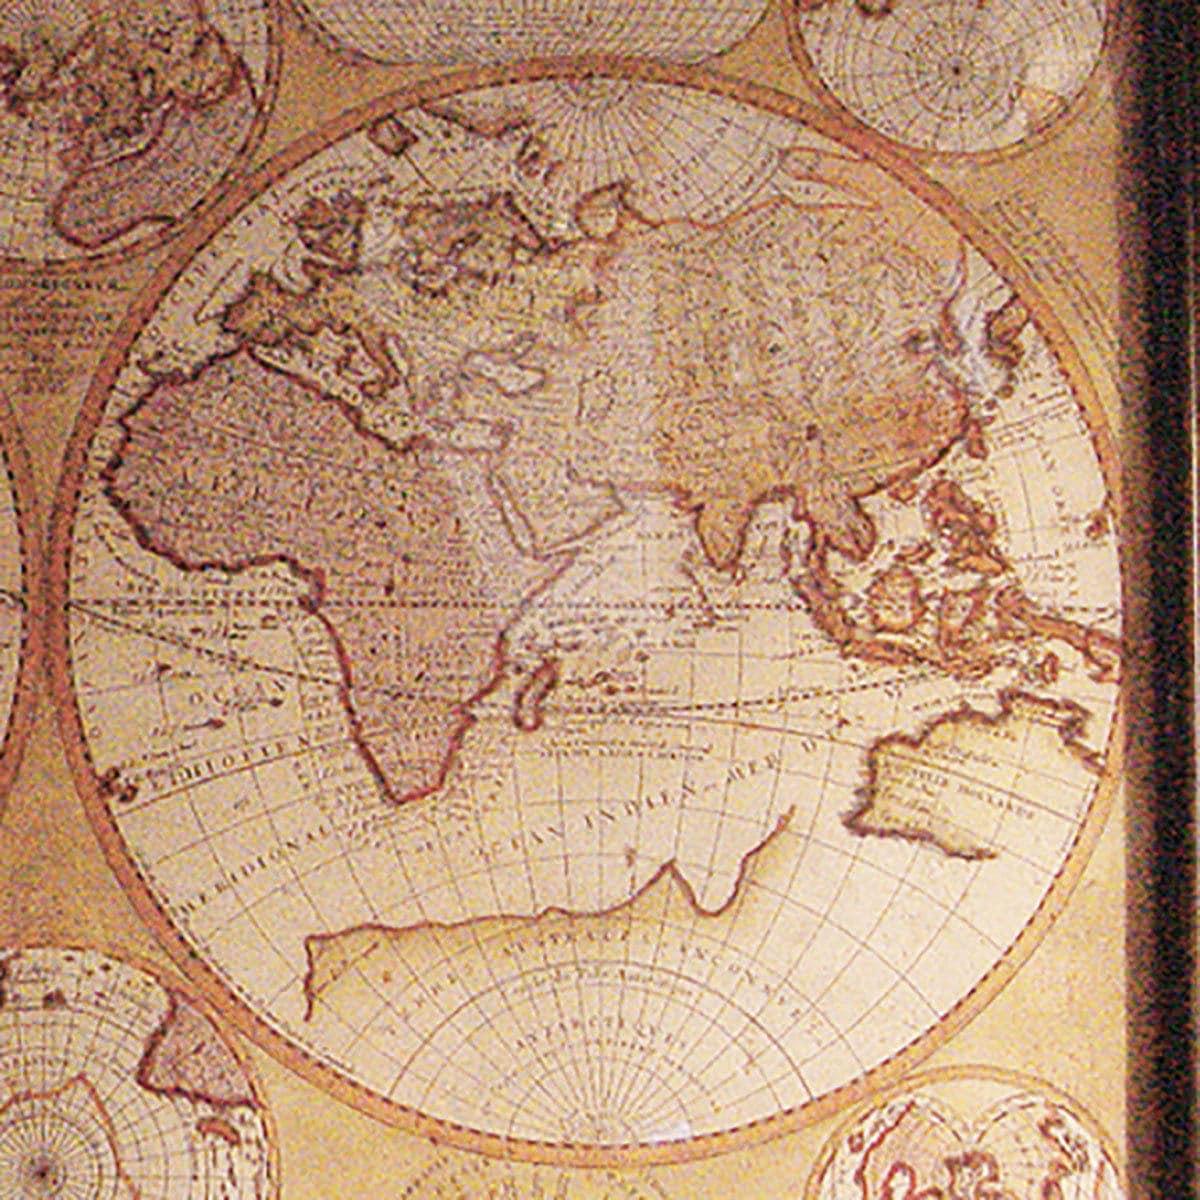 Vintage le globe terrestre 1690 world map walnutglass framed in vgc gallery photo gallery photo gallery photo gallery photo gumiabroncs Choice Image